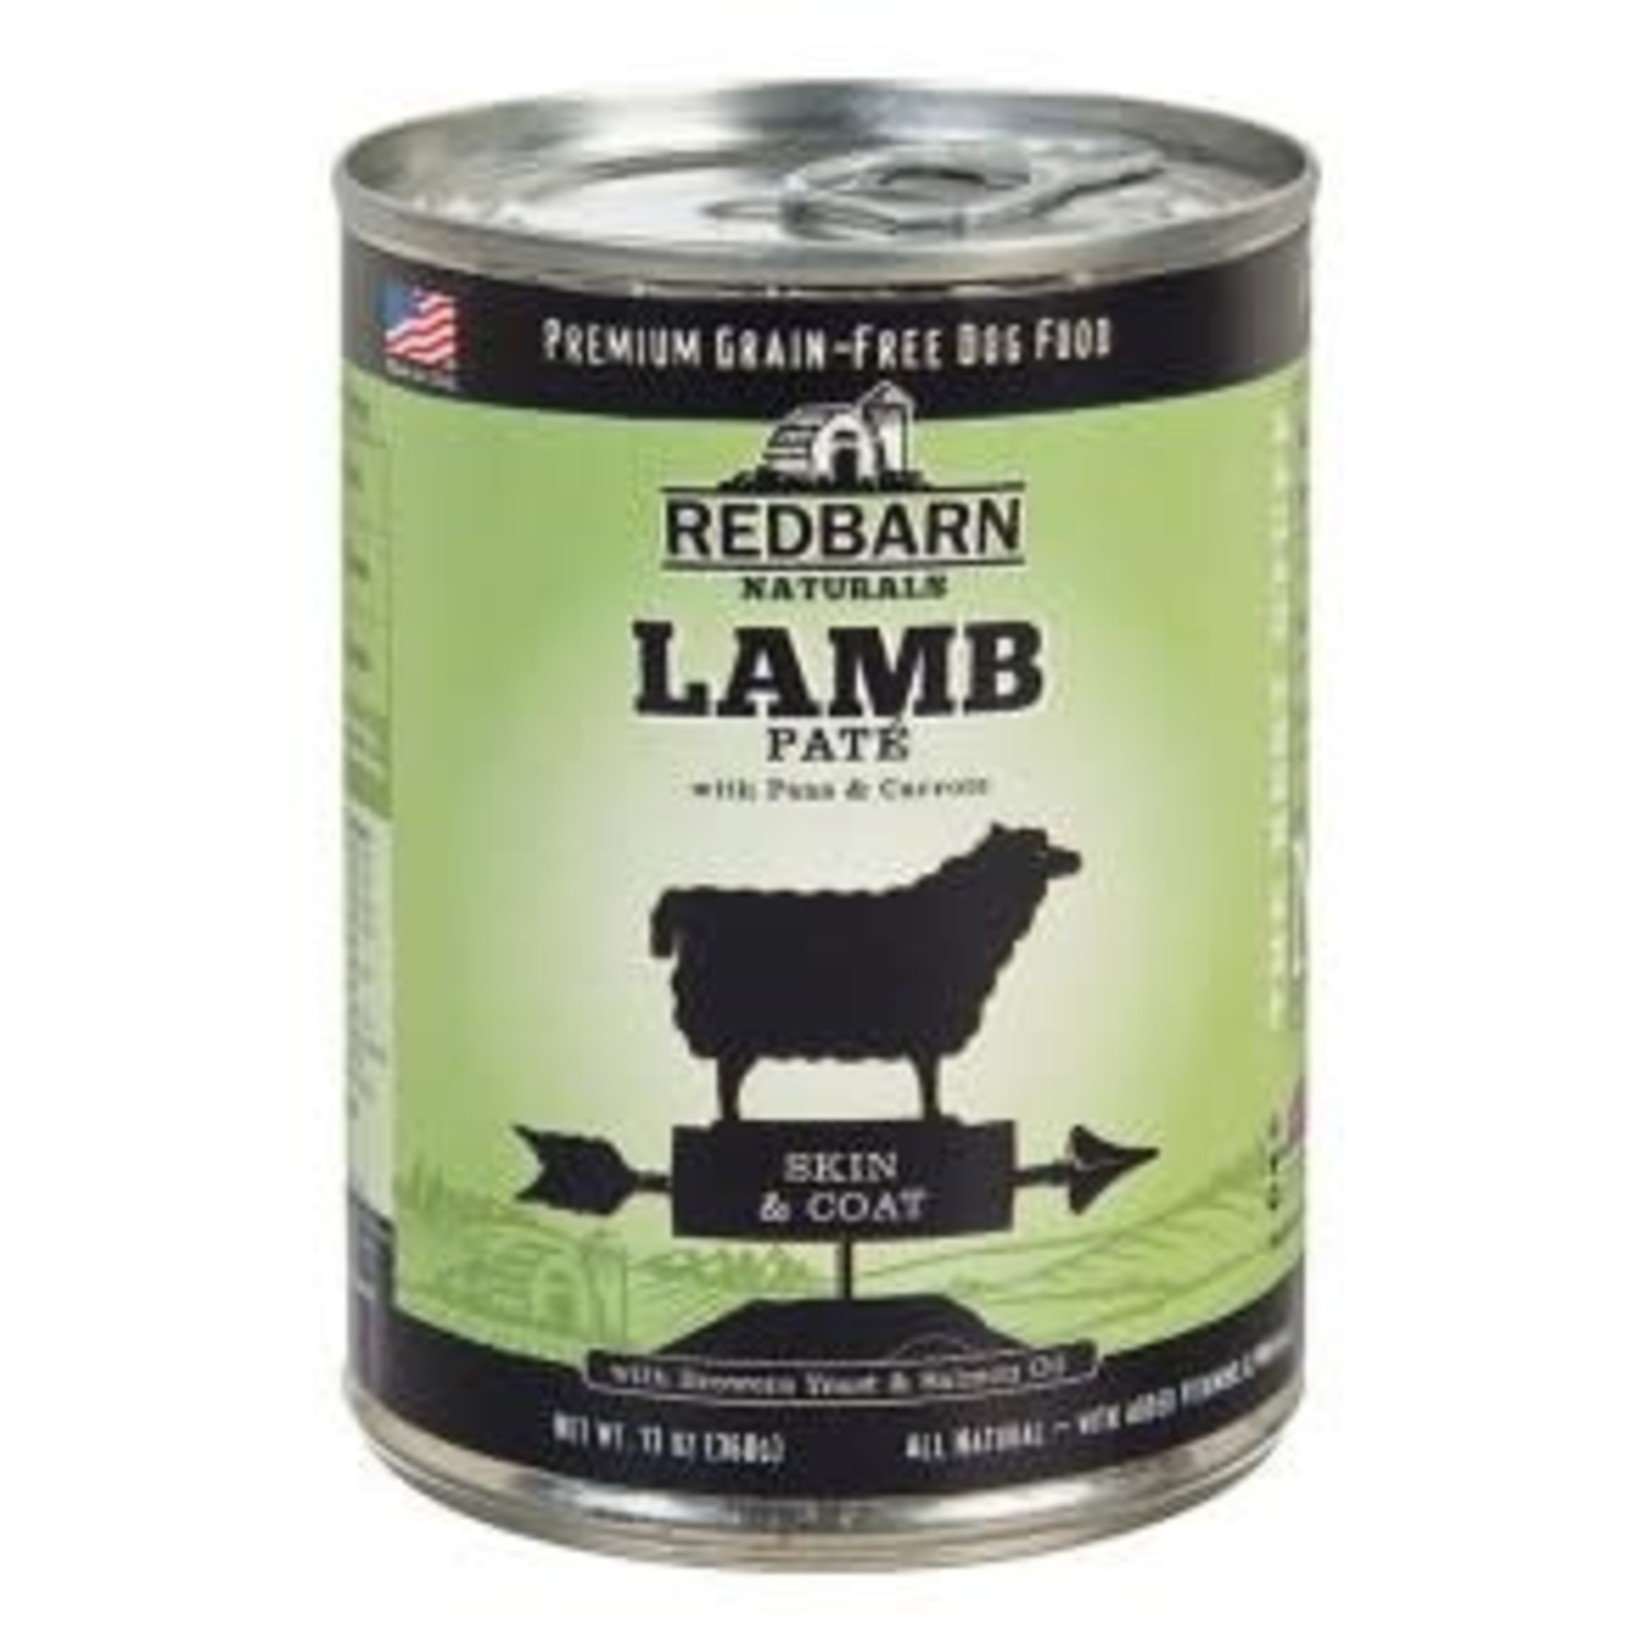 Red Barn REDBARN Lamb Pate Skin & Coat Can Dog 13oz